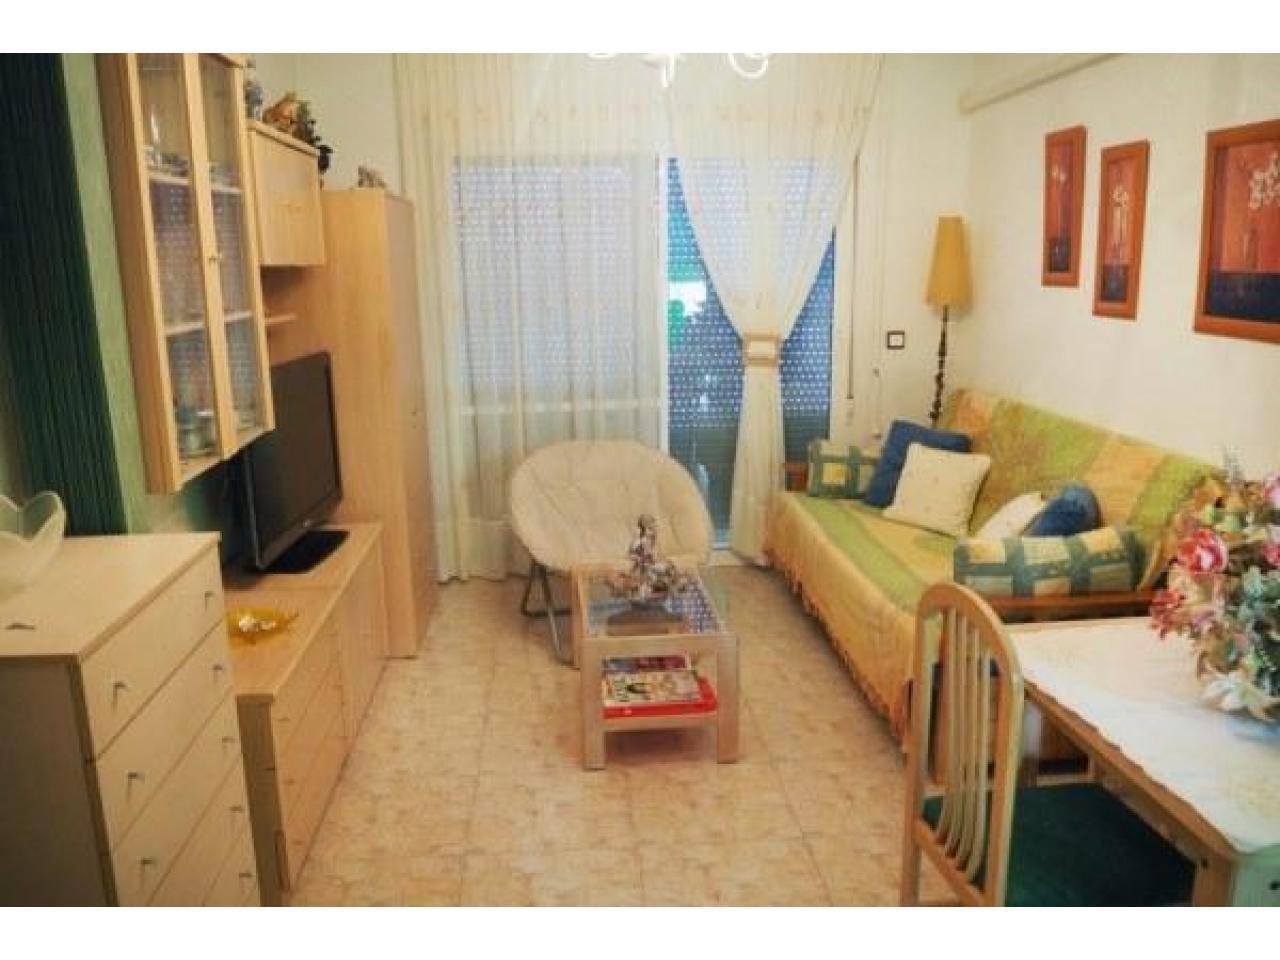 Недвижимость в Испании, Квартира c видами на море в Торревьеха,Коста Бланка,Испания - 2